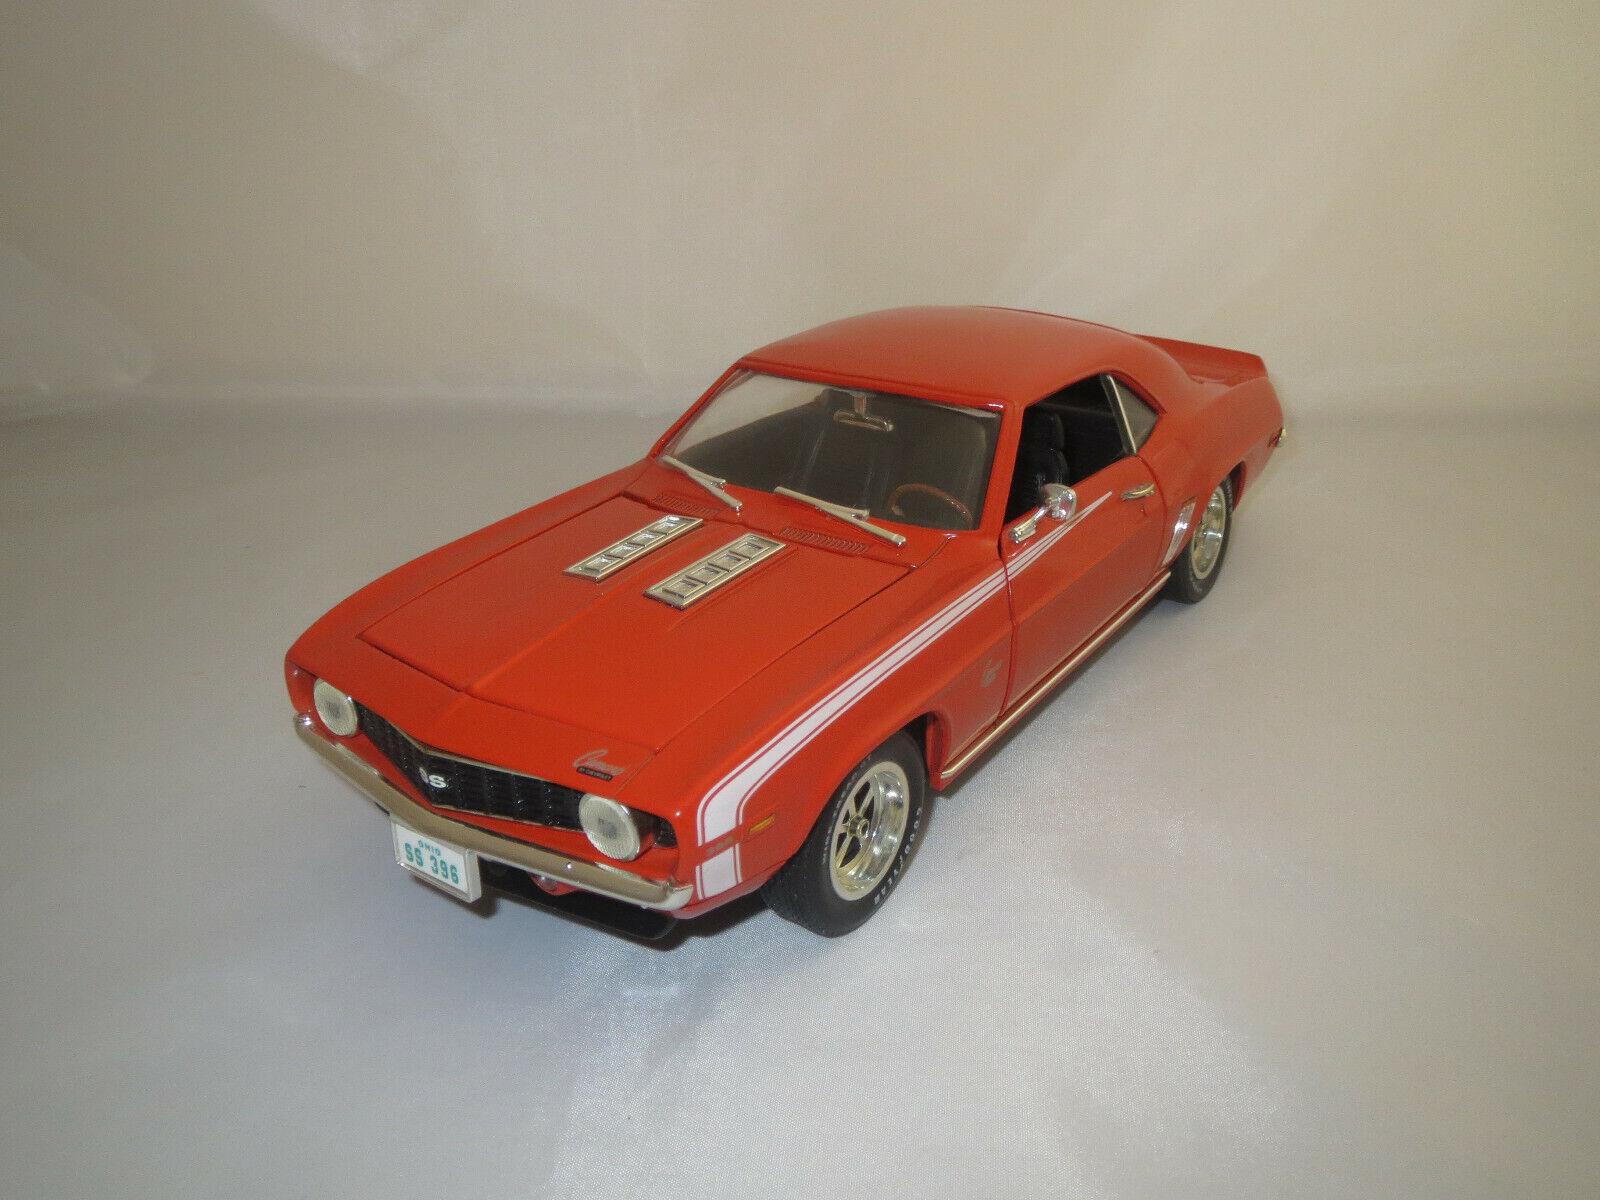 ERTL American Muscle CHEVROLET CAMARO SS  396 (1969)  Orange  1 18 Sans VP.  autorisation officielle